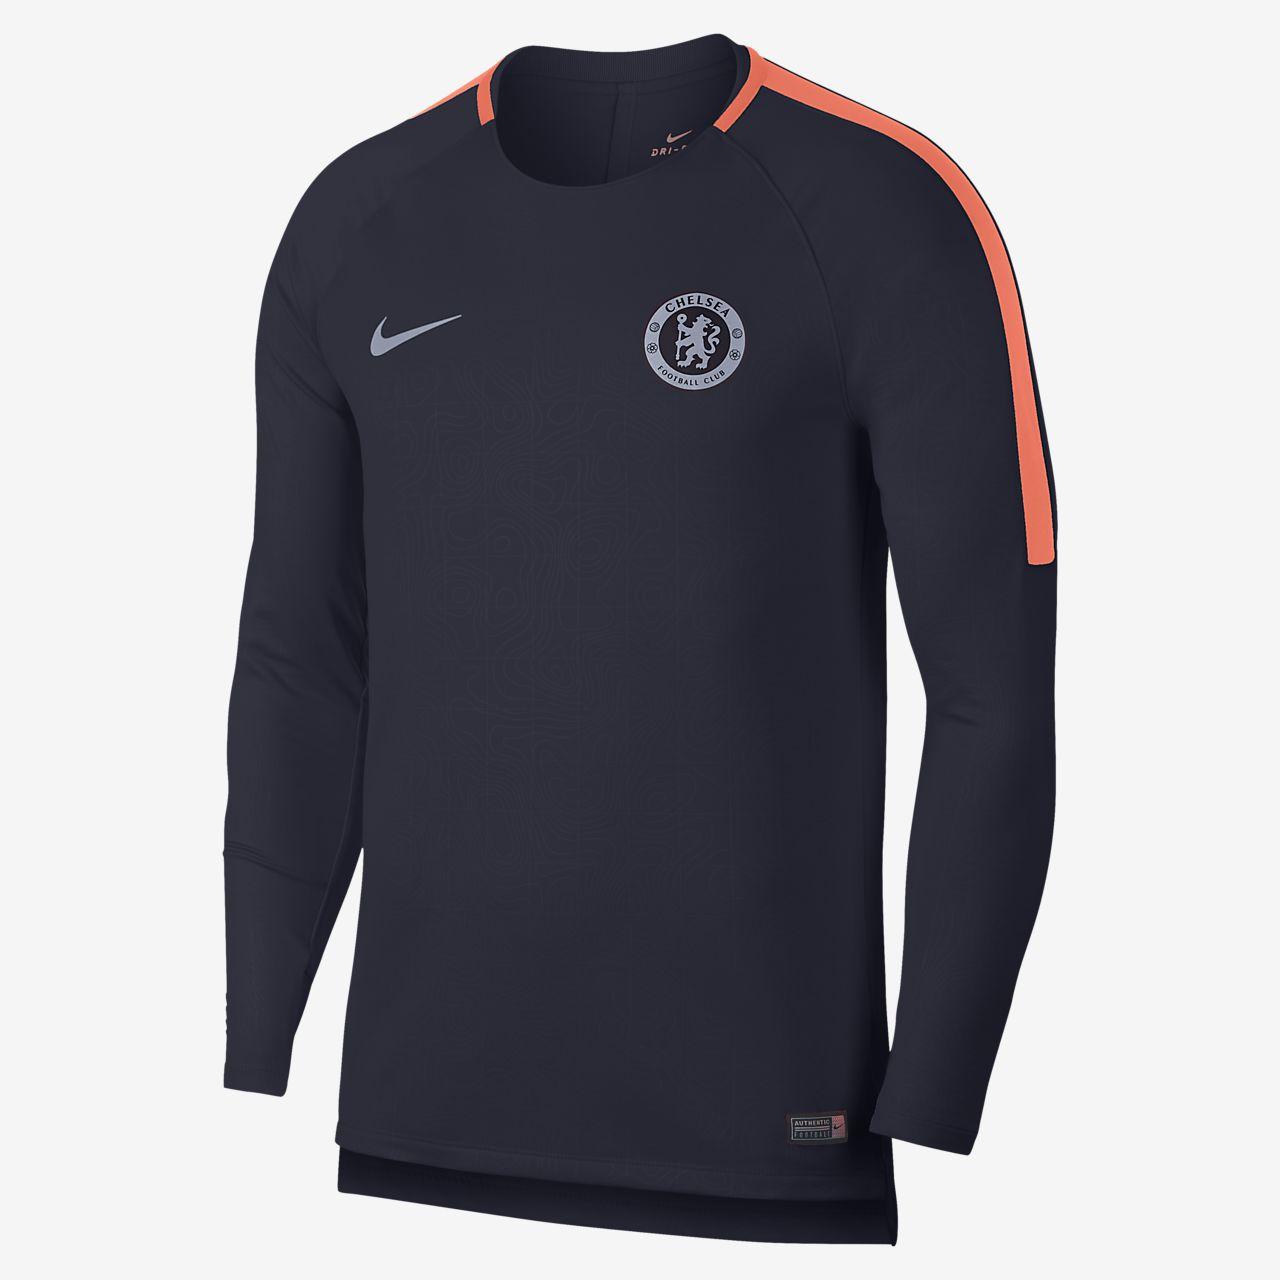 1be0974af Chelsea FC Dri-FIT Squad Men s Long-Sleeve Football Top. Nike.com AE